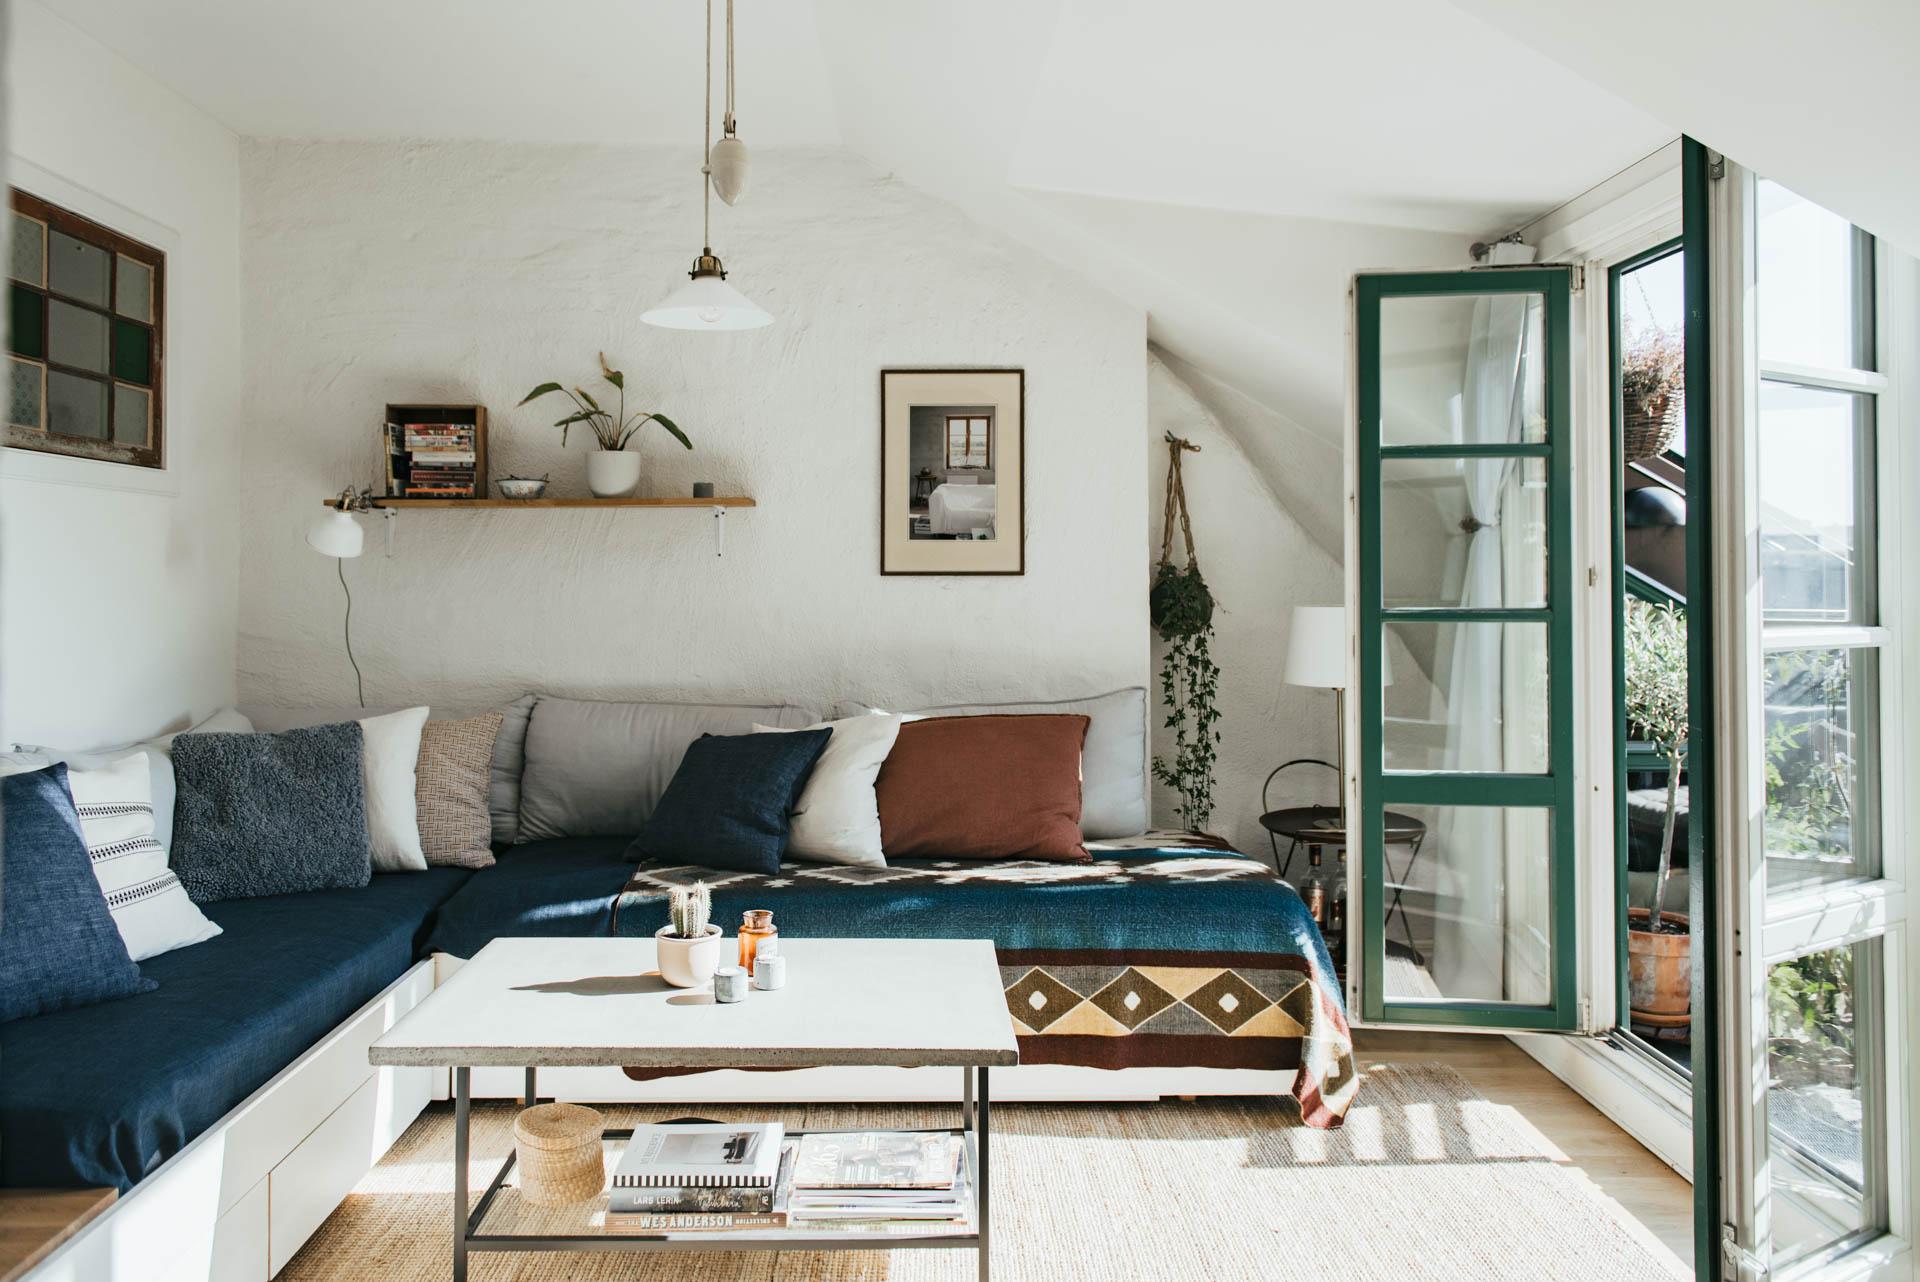 Claves para un estilo boho en decoraci n blog de muebles - Salon boho chic ...